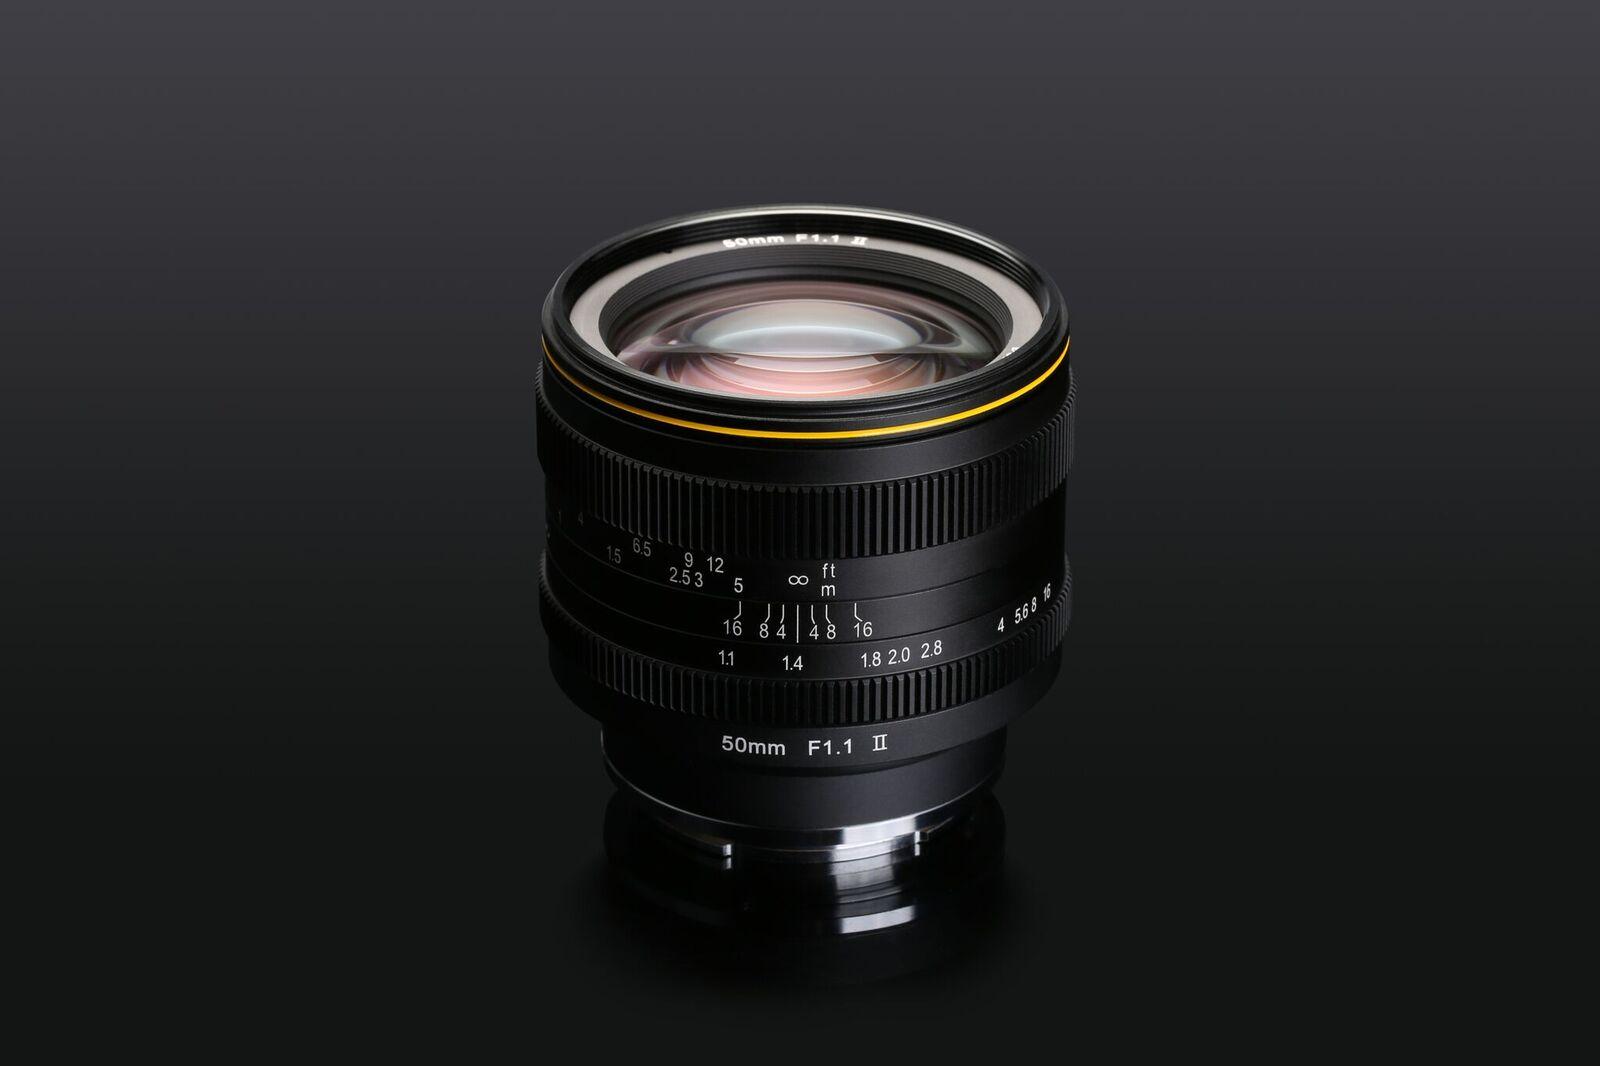 KAMLAN-KL 50MM-F1.1二代镜头众筹完美收官